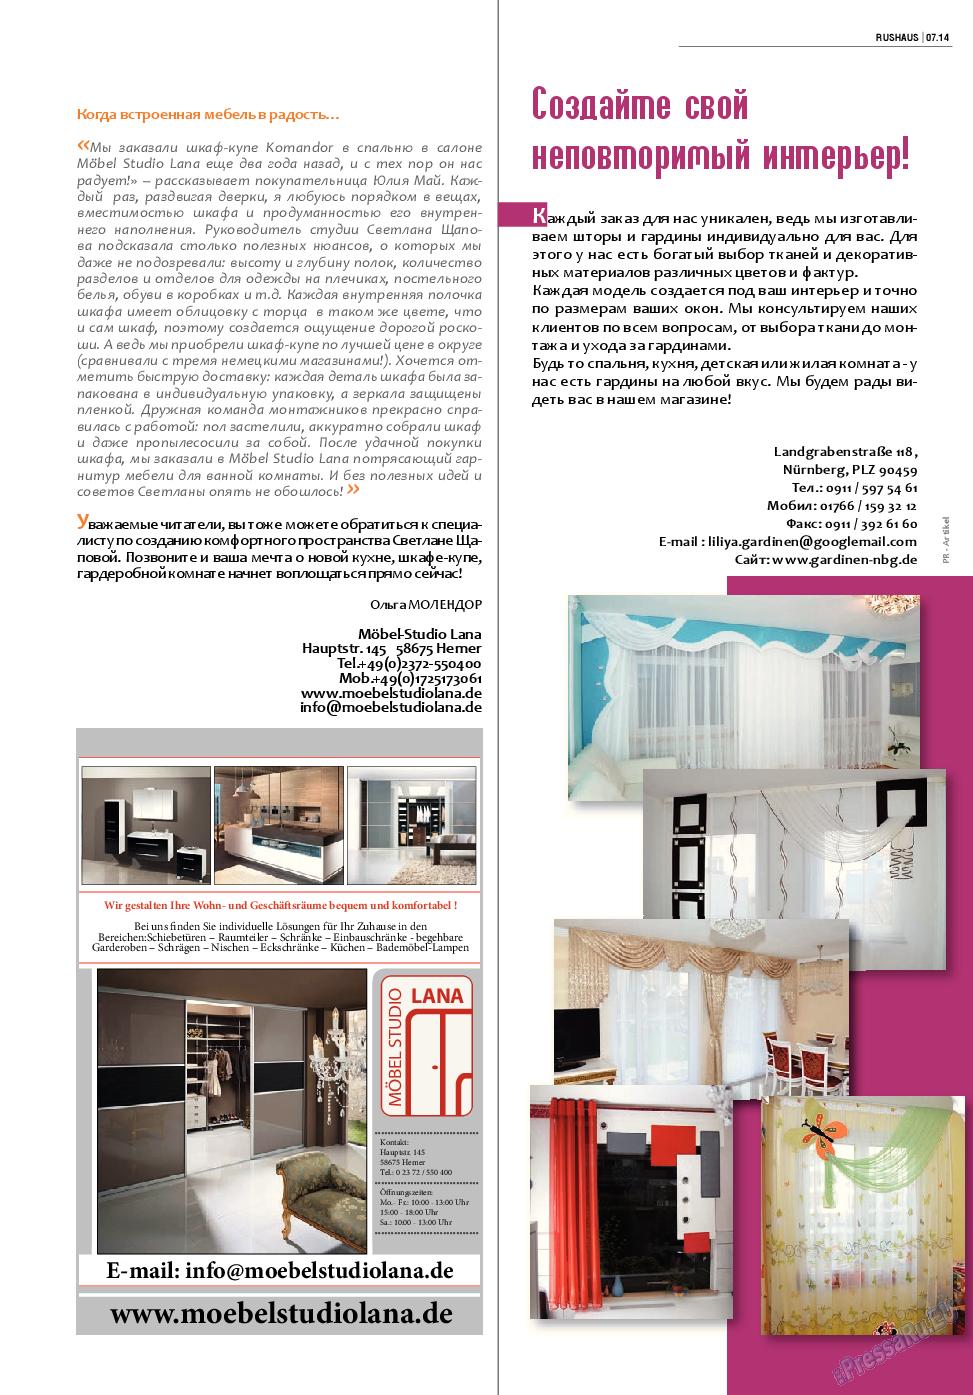 RusHaus (журнал). 2014 год, номер 1, стр. 19